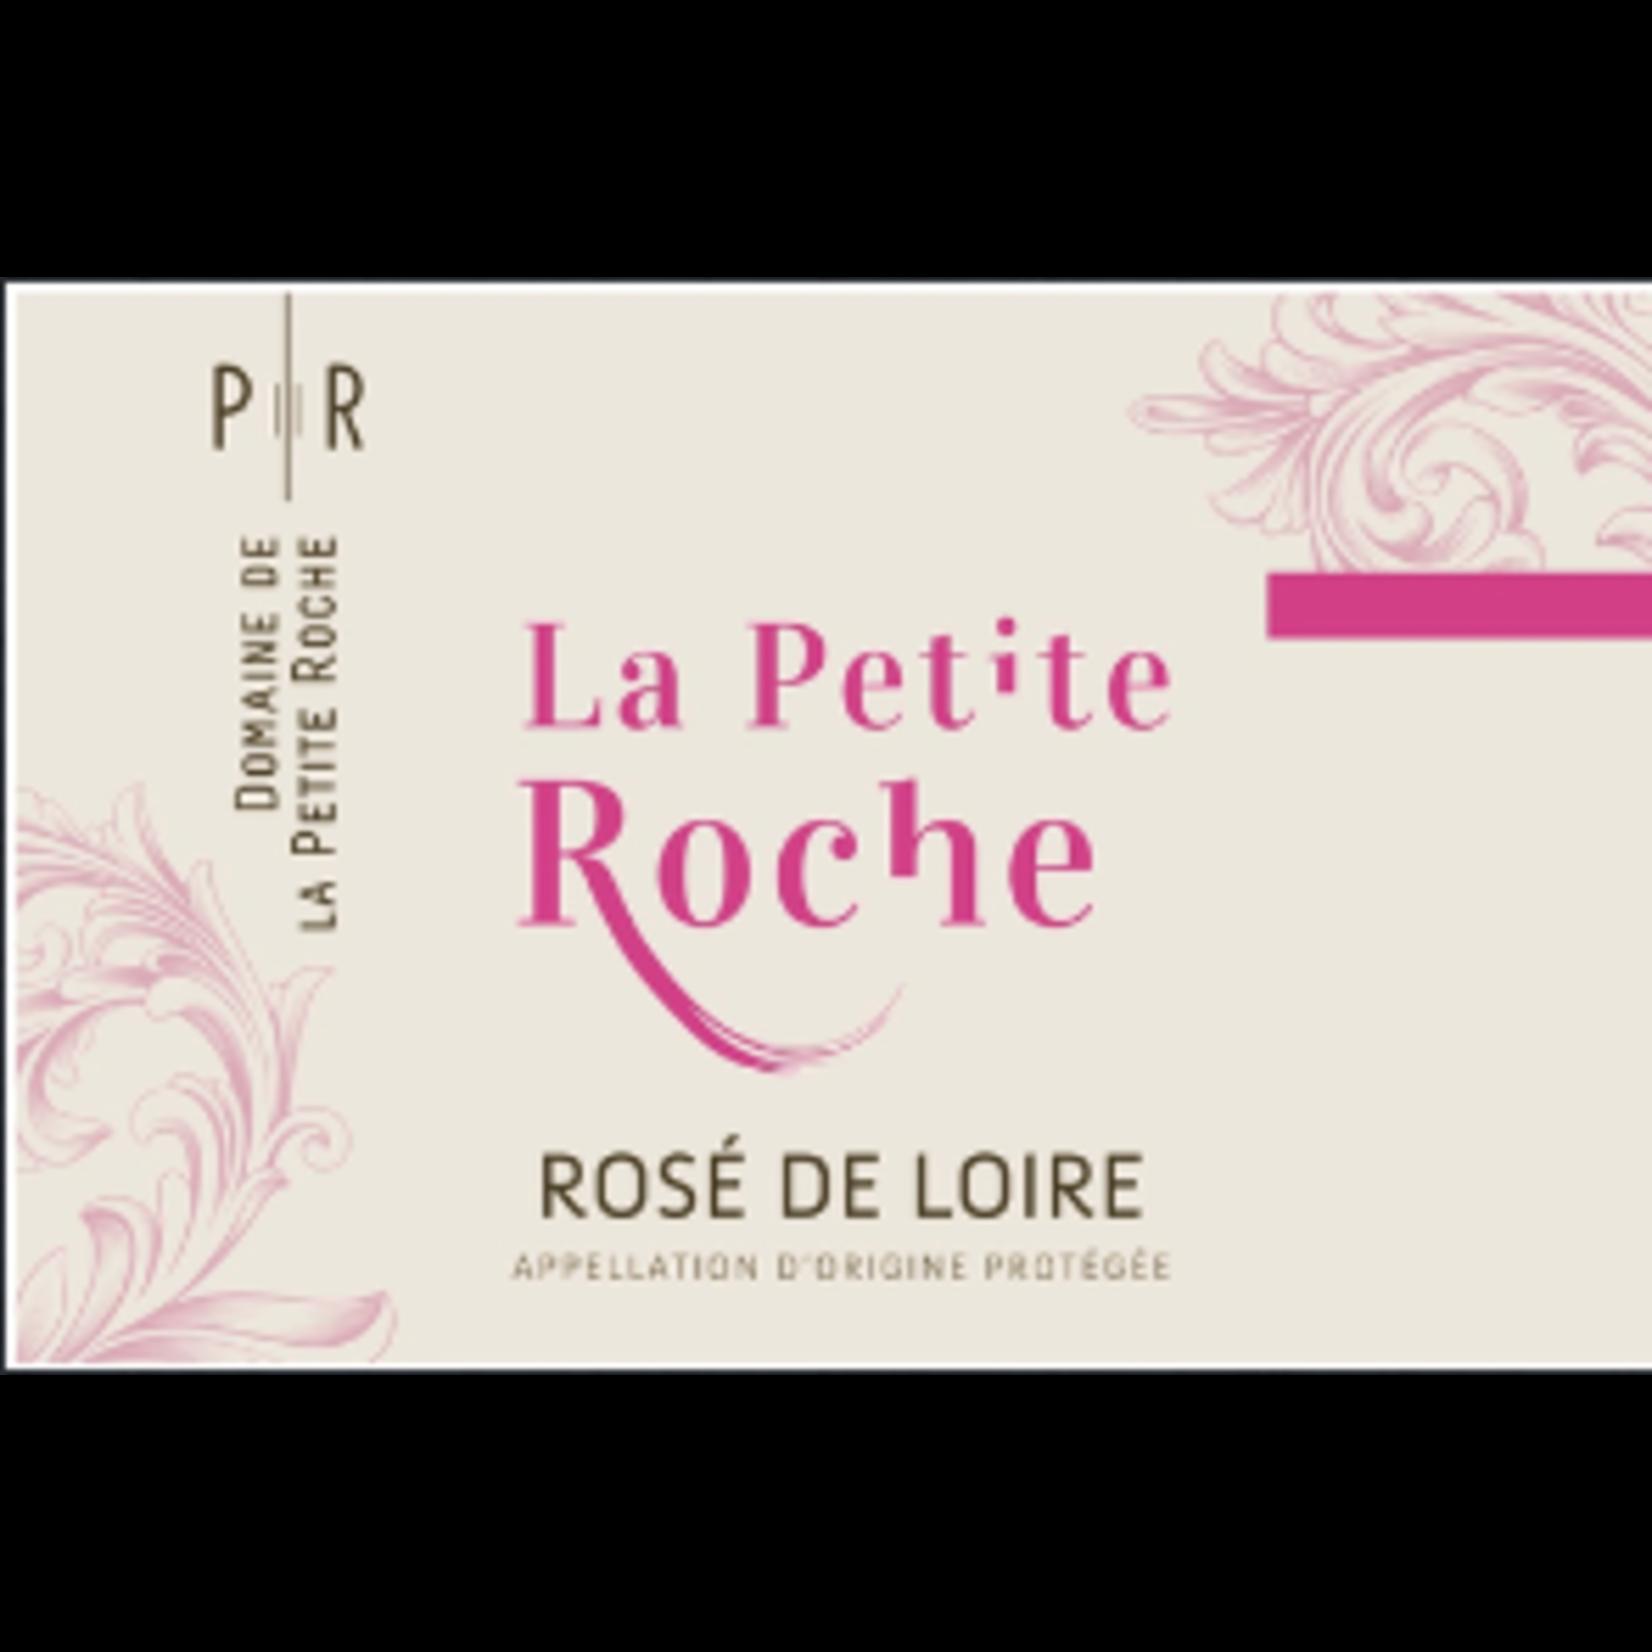 Domaine de la Petite Roche La Petite Roche Rose 2020 Loire, France